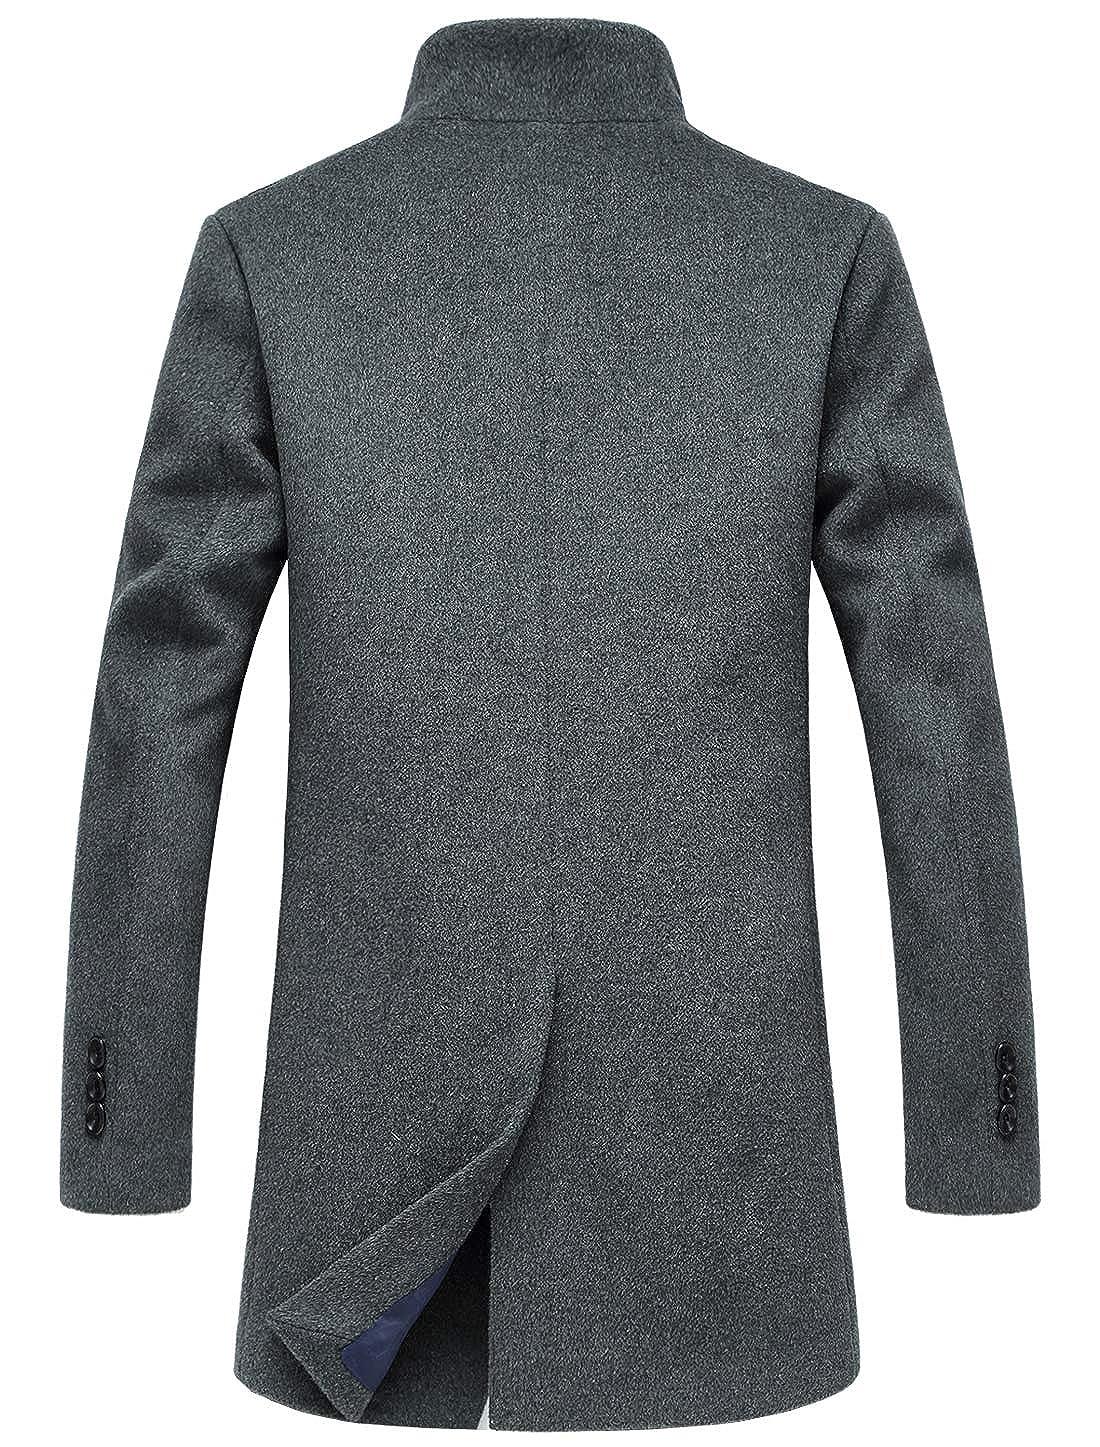 chouyatou Mens Mid-Length Single Breasted Wool Blend Top Coat